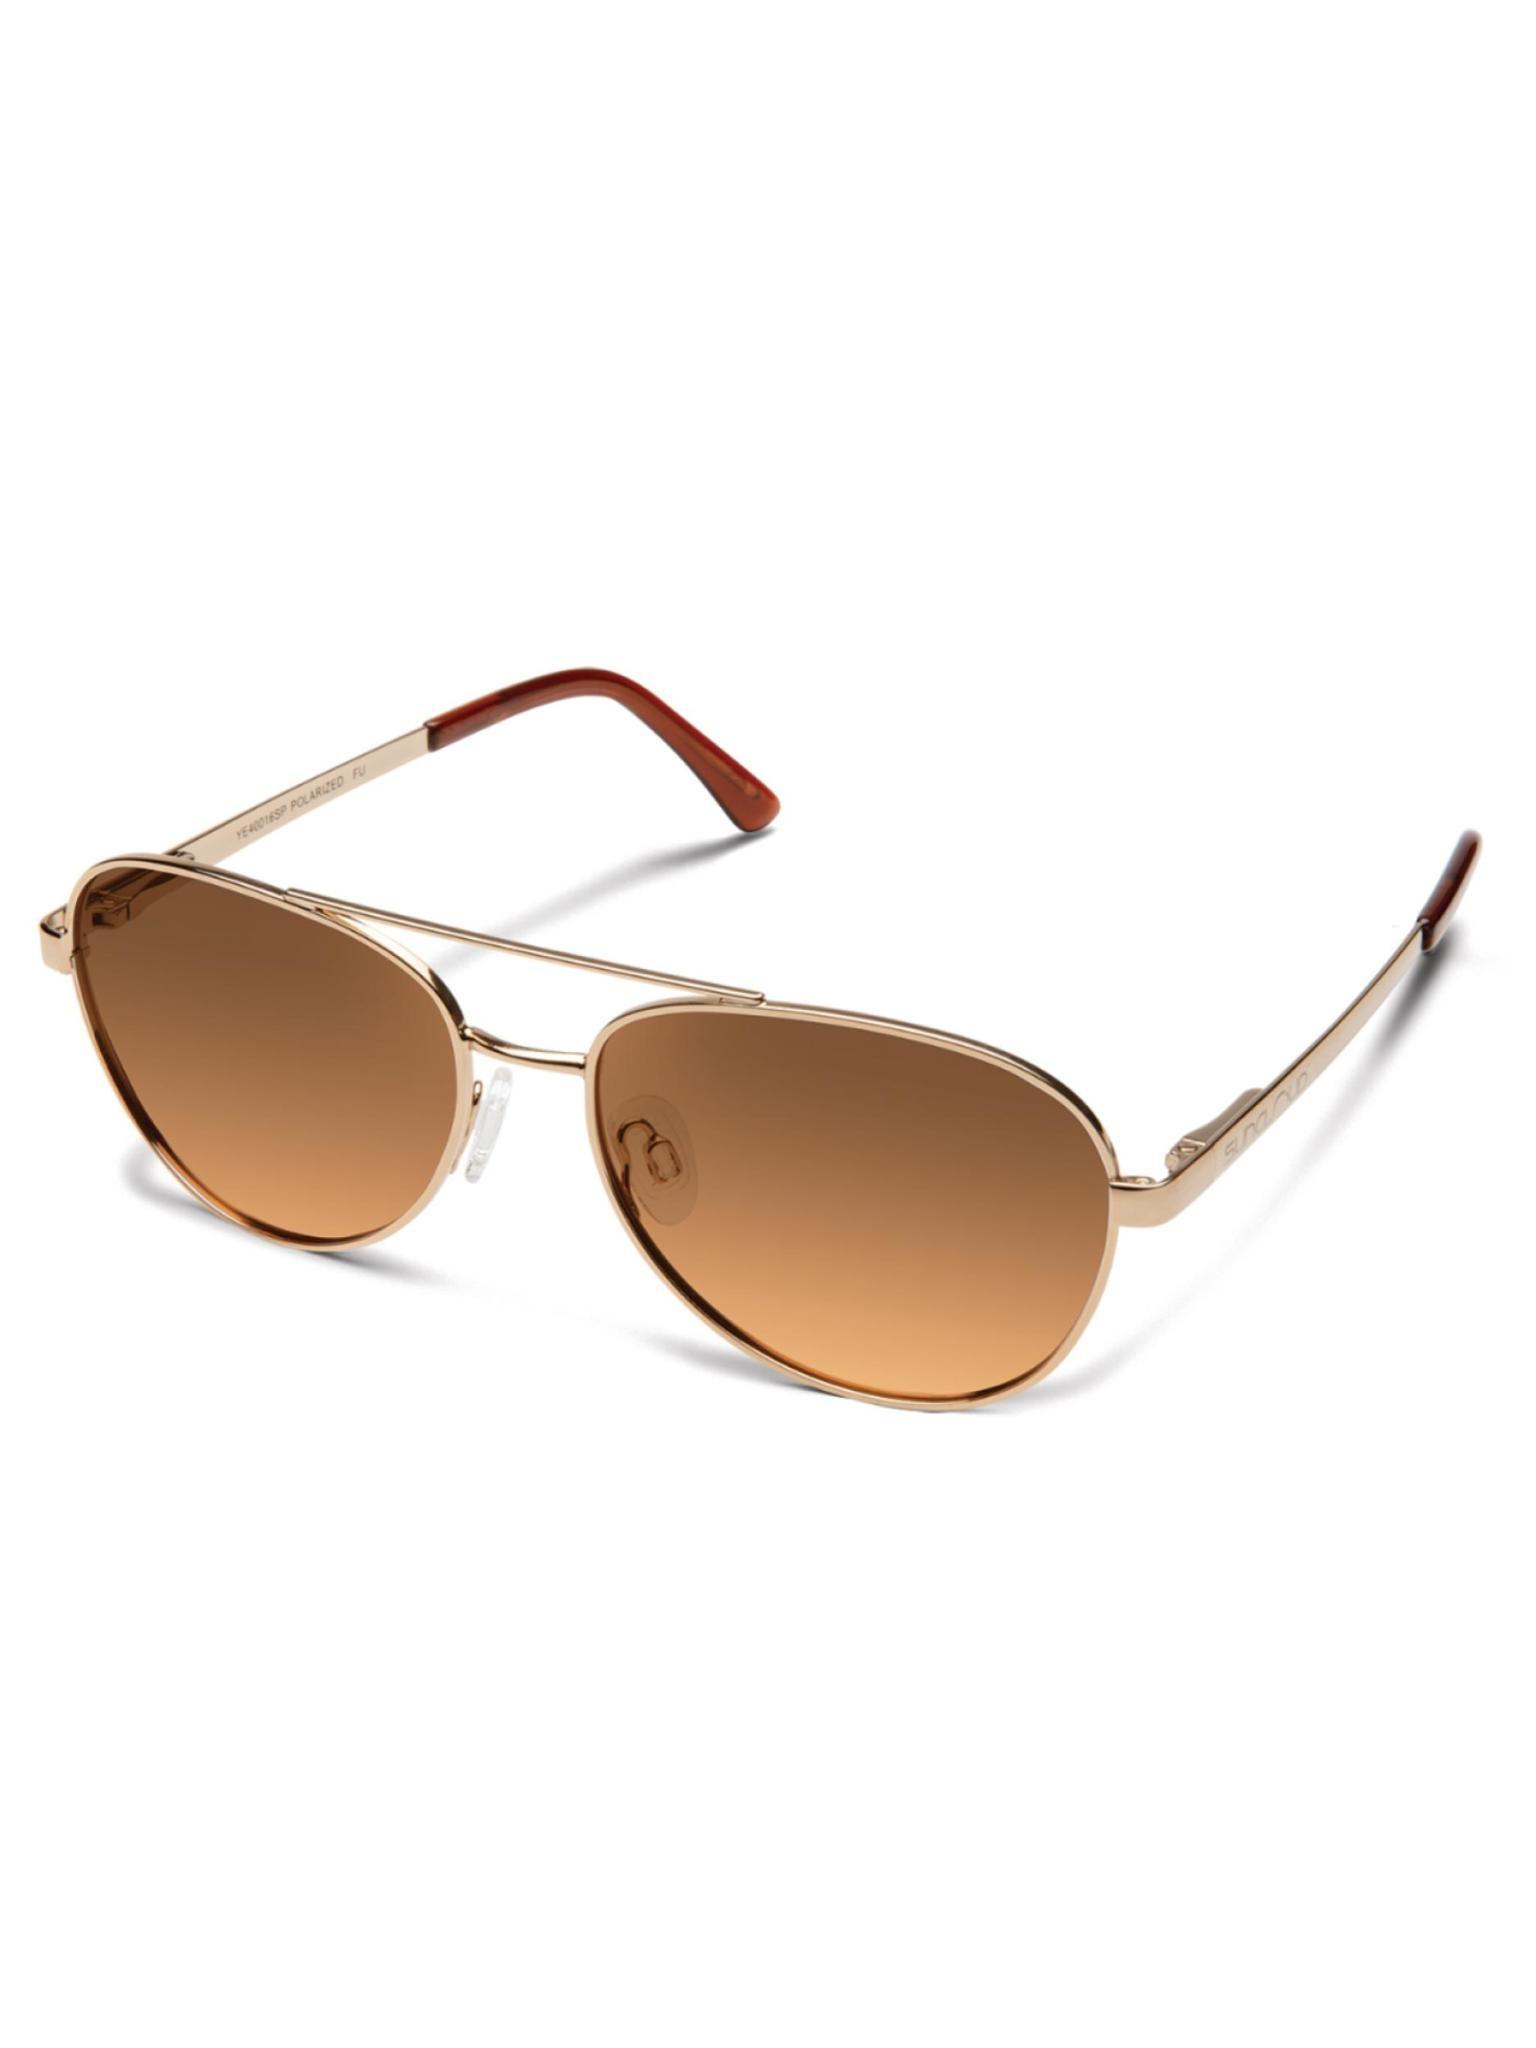 Callsign Sunglasses Rose Gold Polarized Brown